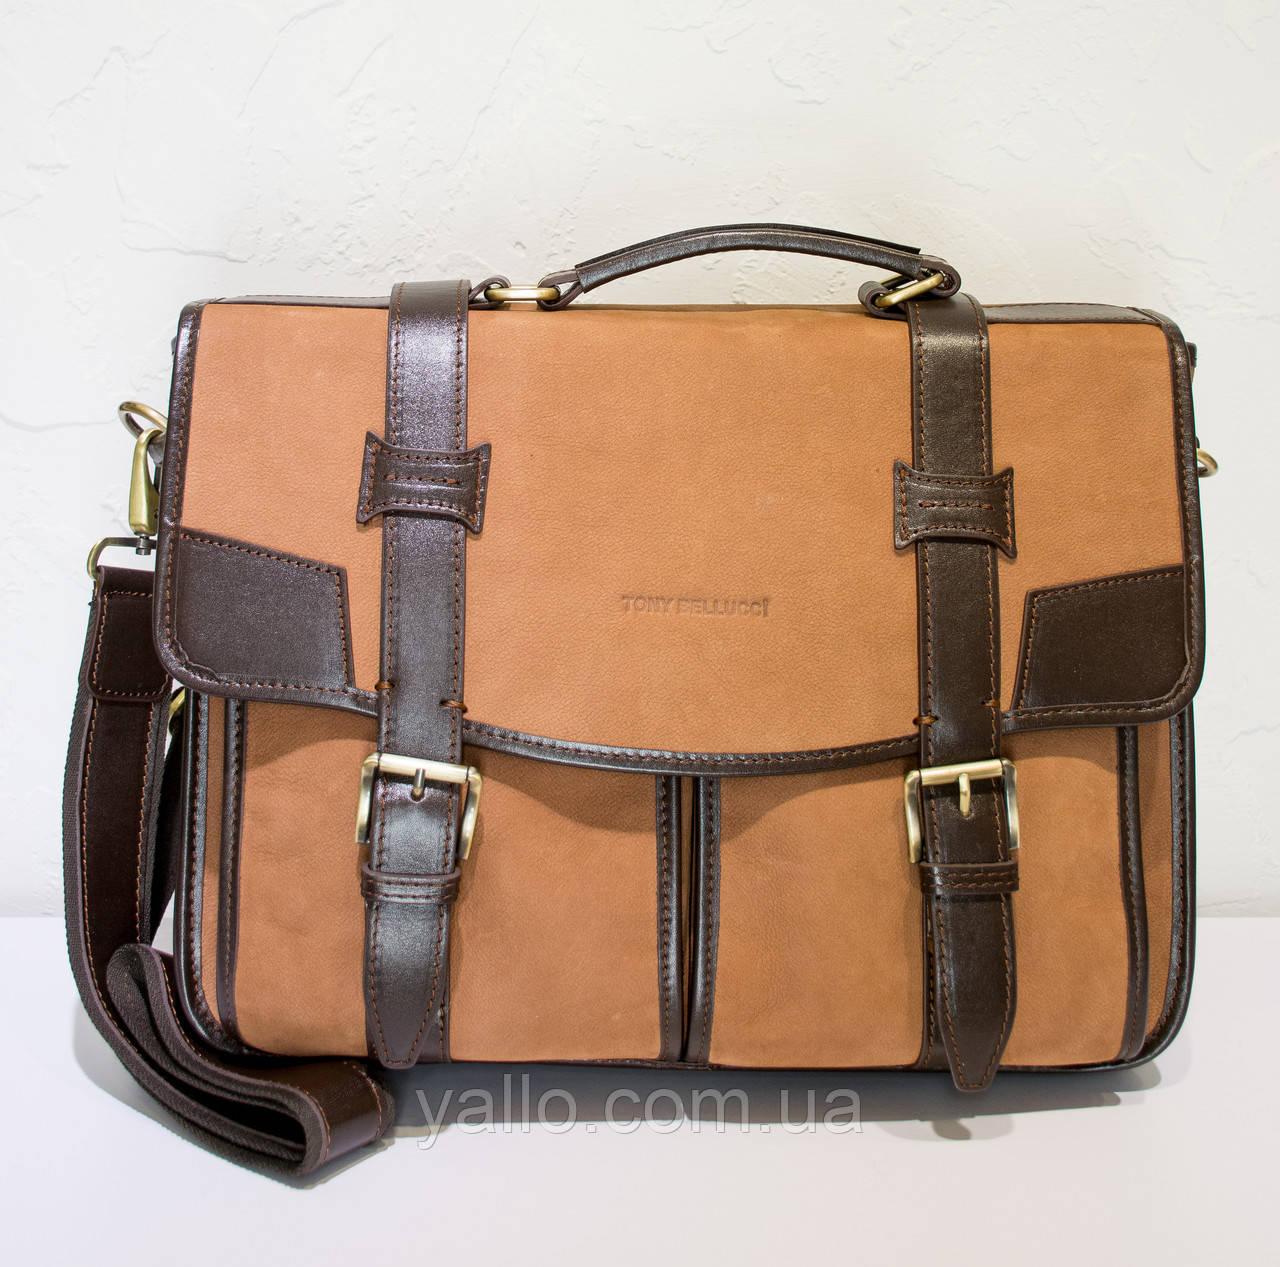 Натуральная кожаная сумка для мужчин Tony Bellucci T5123-400